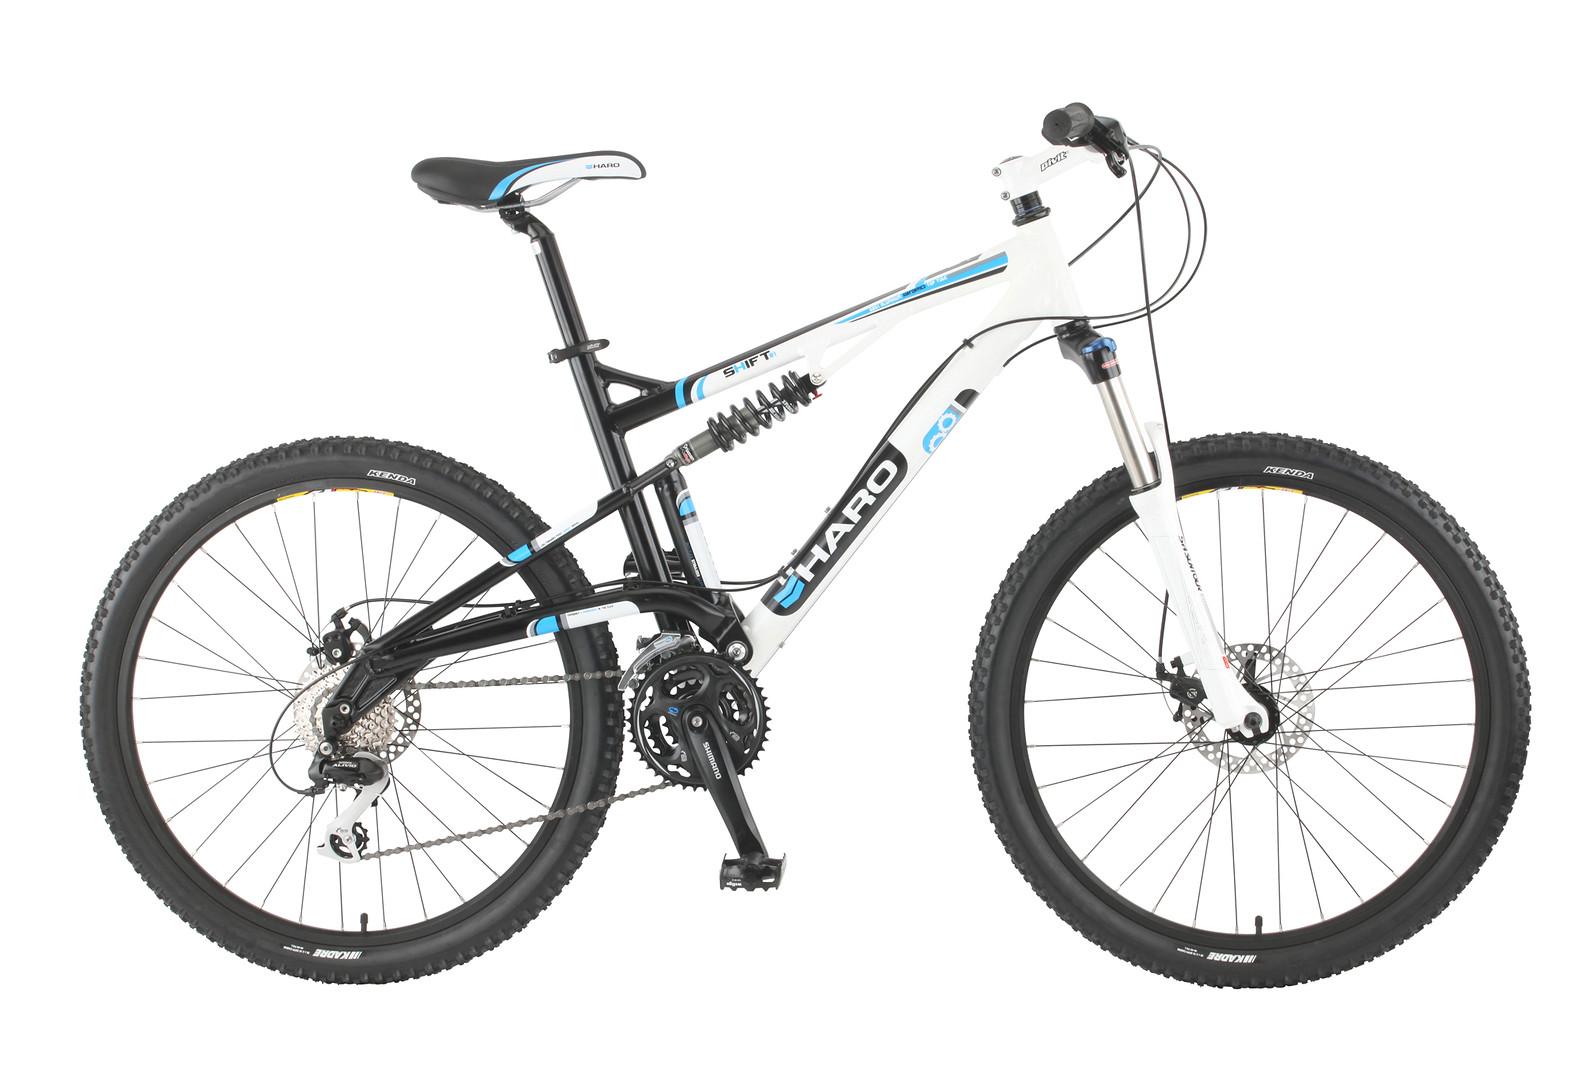 2011 Haro Shift R1 Bike 2011_shiftr1_blk